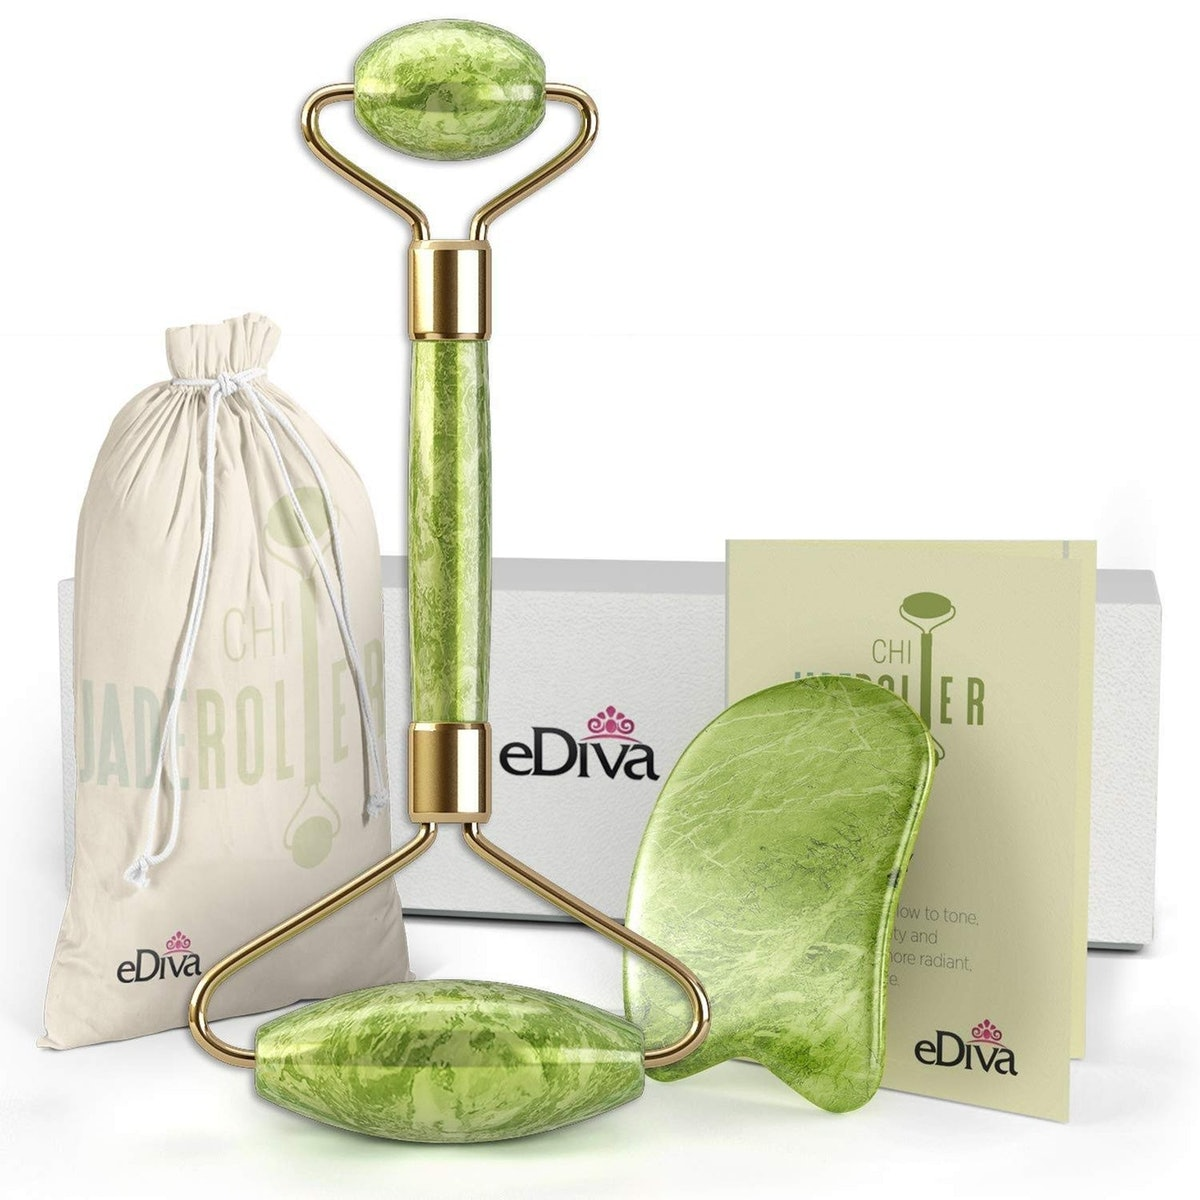 eDiva Natural Jade Roller and Gua Sha